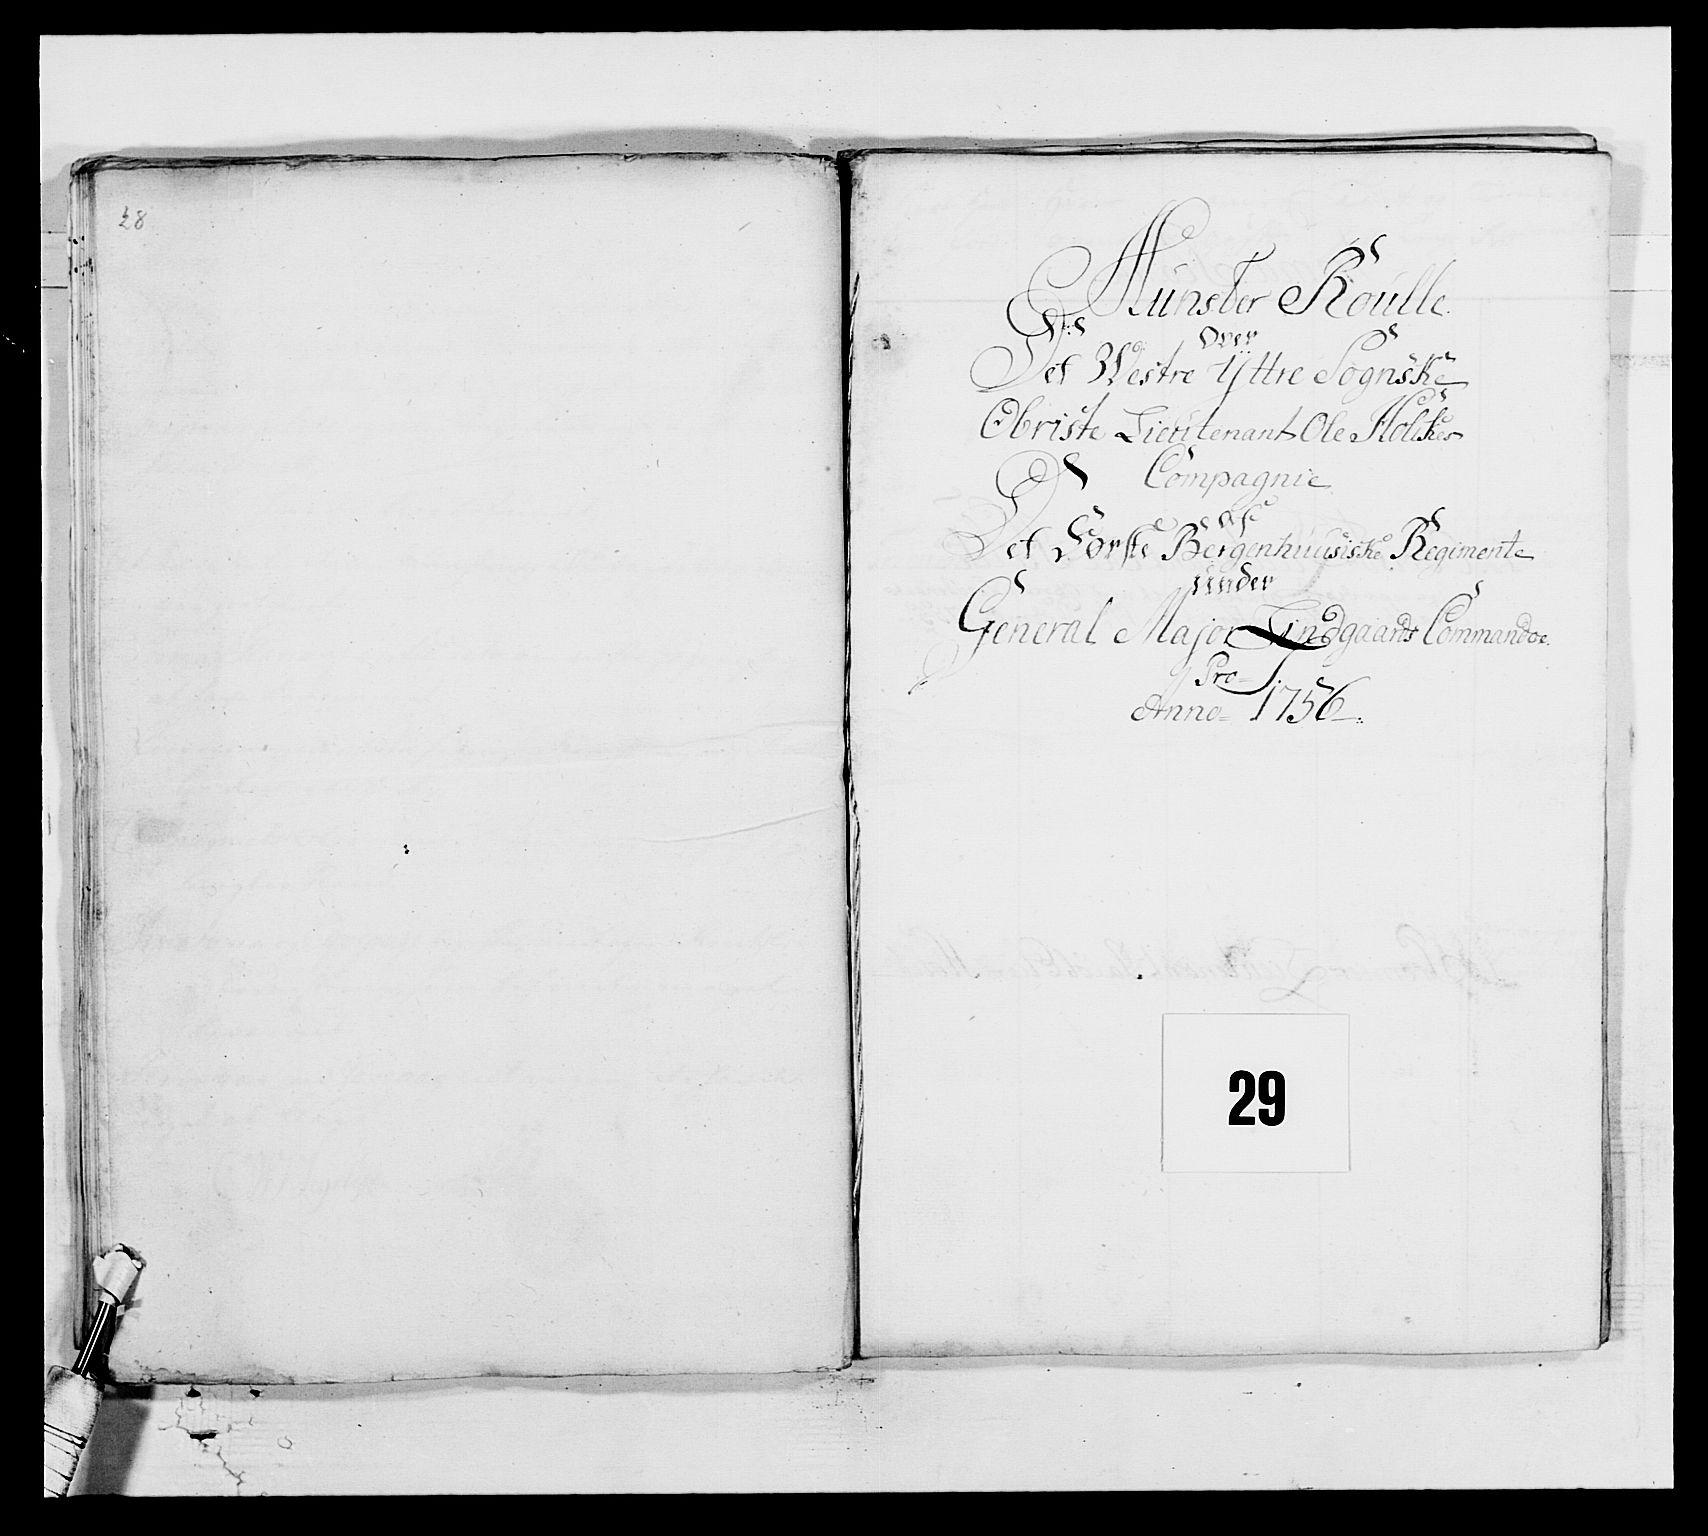 RA, Kommanderende general (KG I) med Det norske krigsdirektorium, E/Ea/L0517: 1. Bergenhusiske regiment, 1742-1756, s. 445